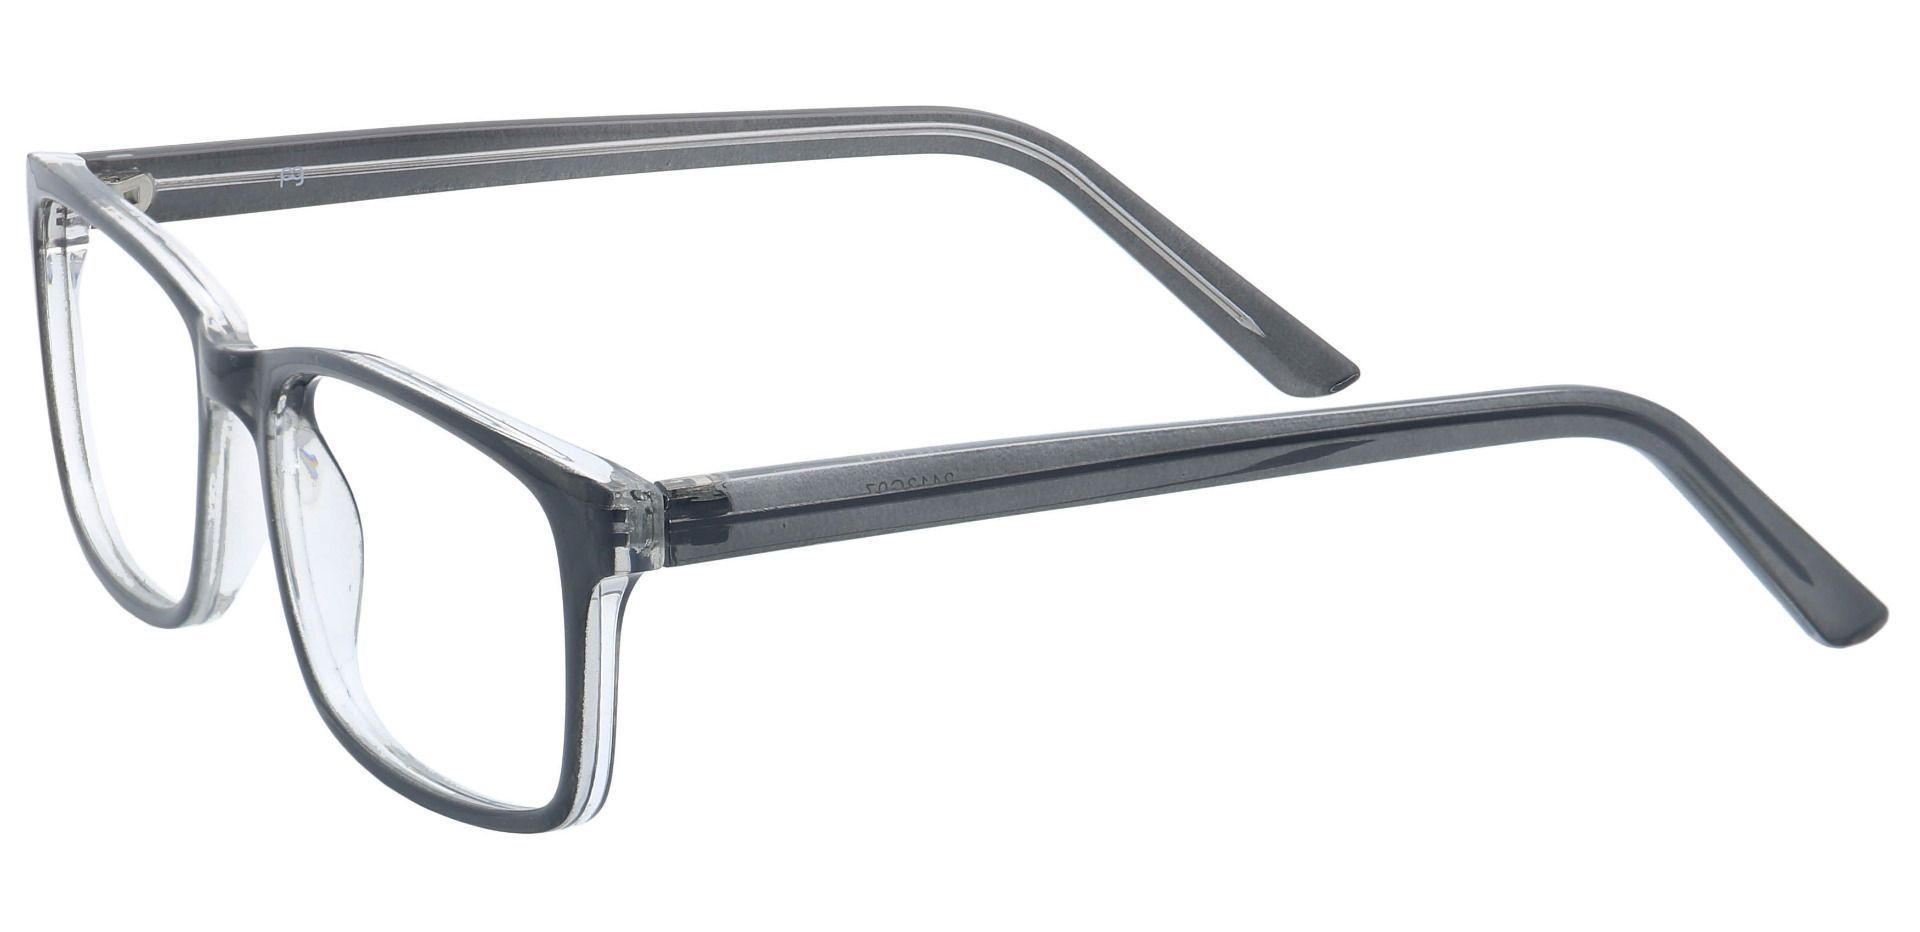 Cruz Rectangle Prescription Glasses - Gray